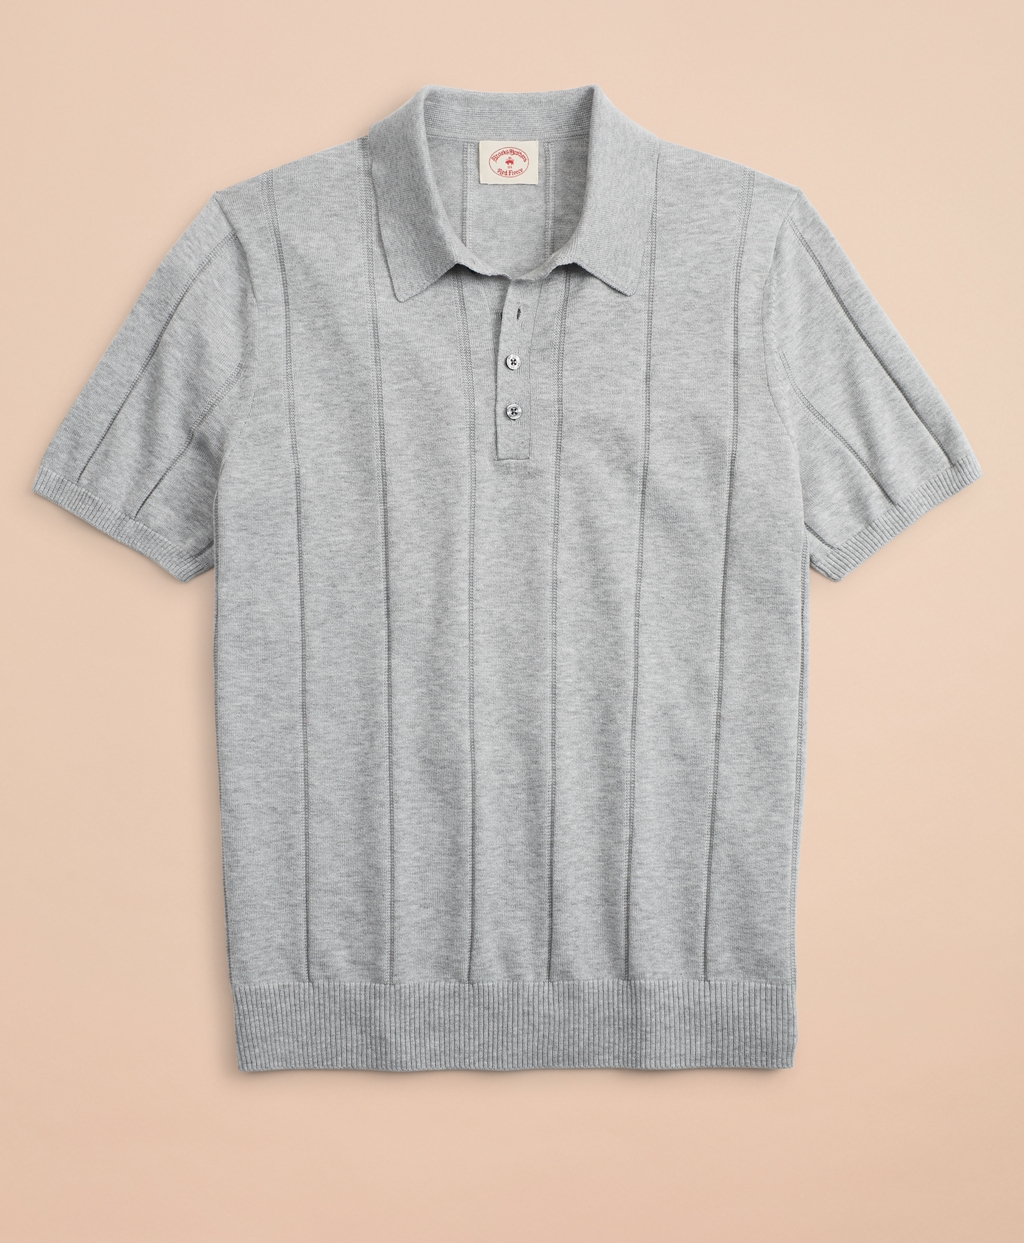 1950s Mens Shirts | Retro Bowling Shirts, Vintage Hawaiian Shirts Brooks Brothers Mens Striped Cotton Sweater Polo $59.50 AT vintagedancer.com